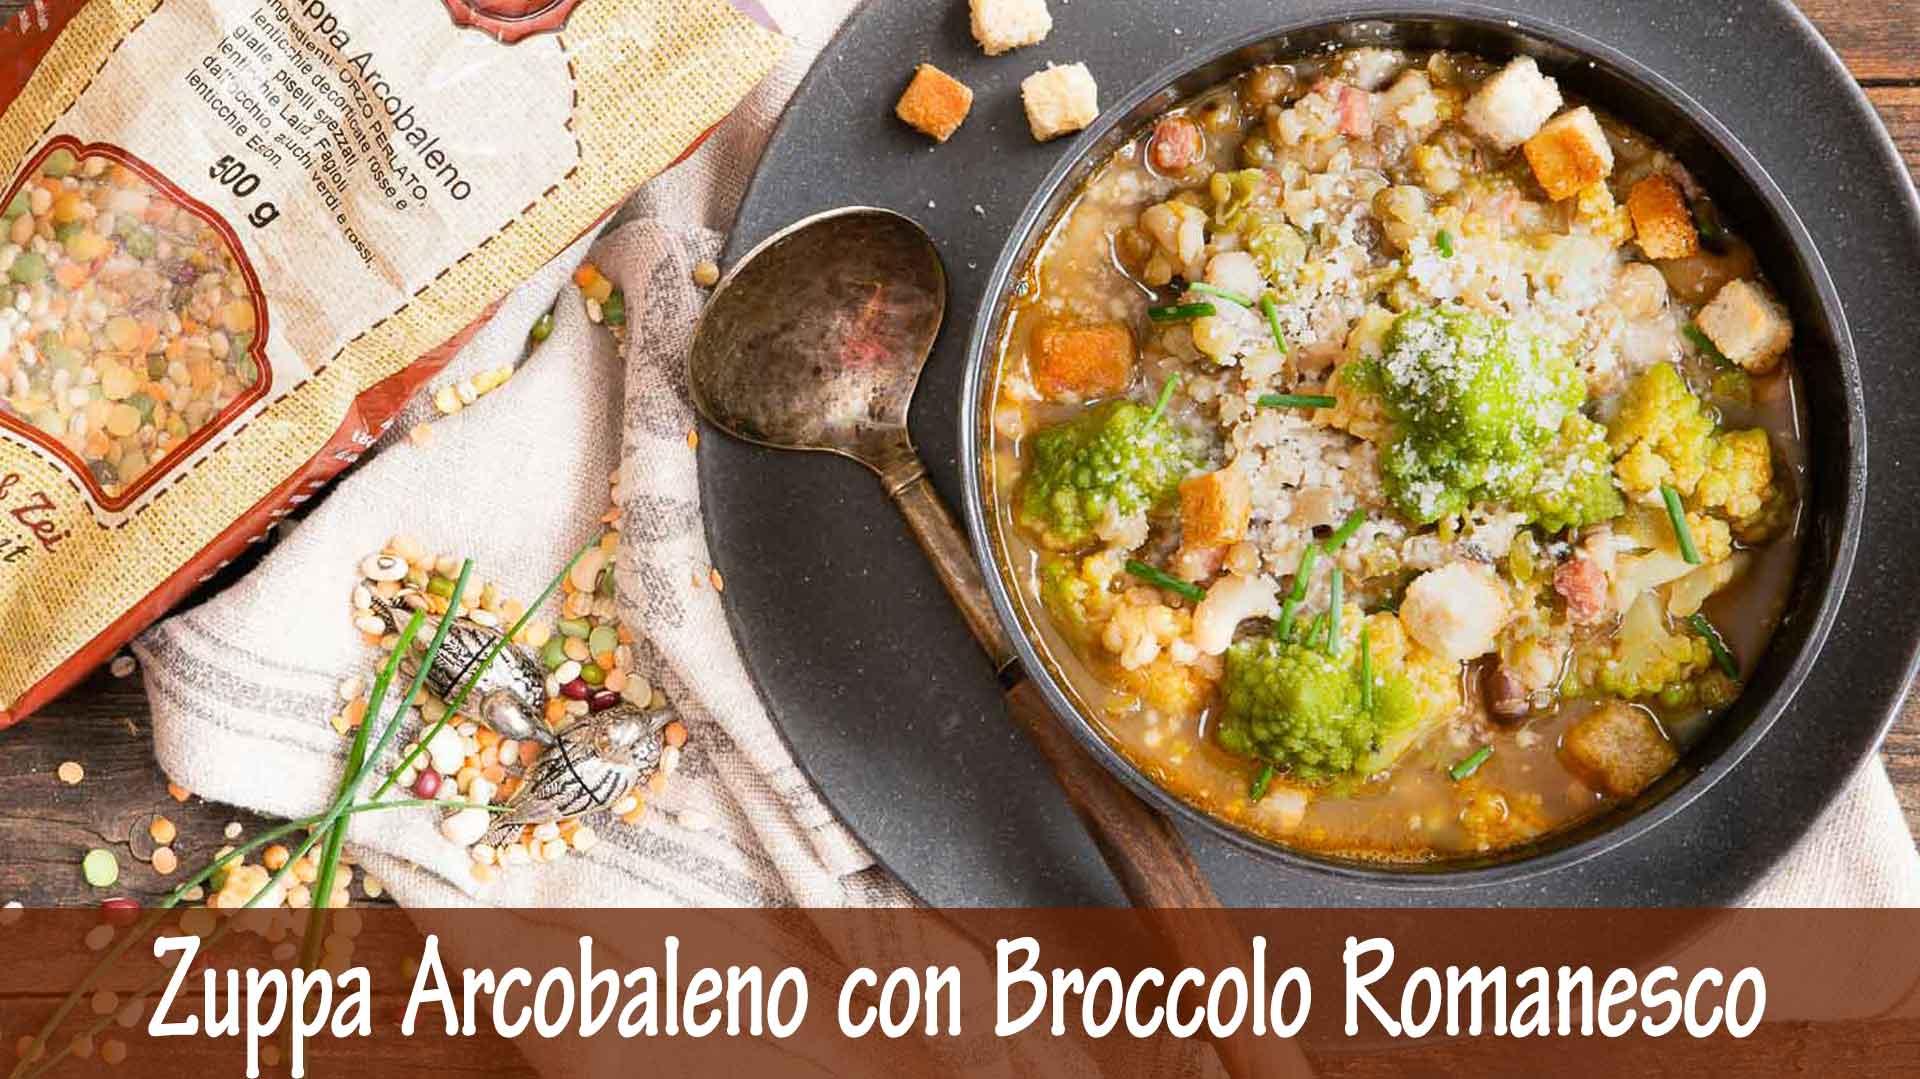 Zuppa Arcobaleno con Broccolo Romanesco